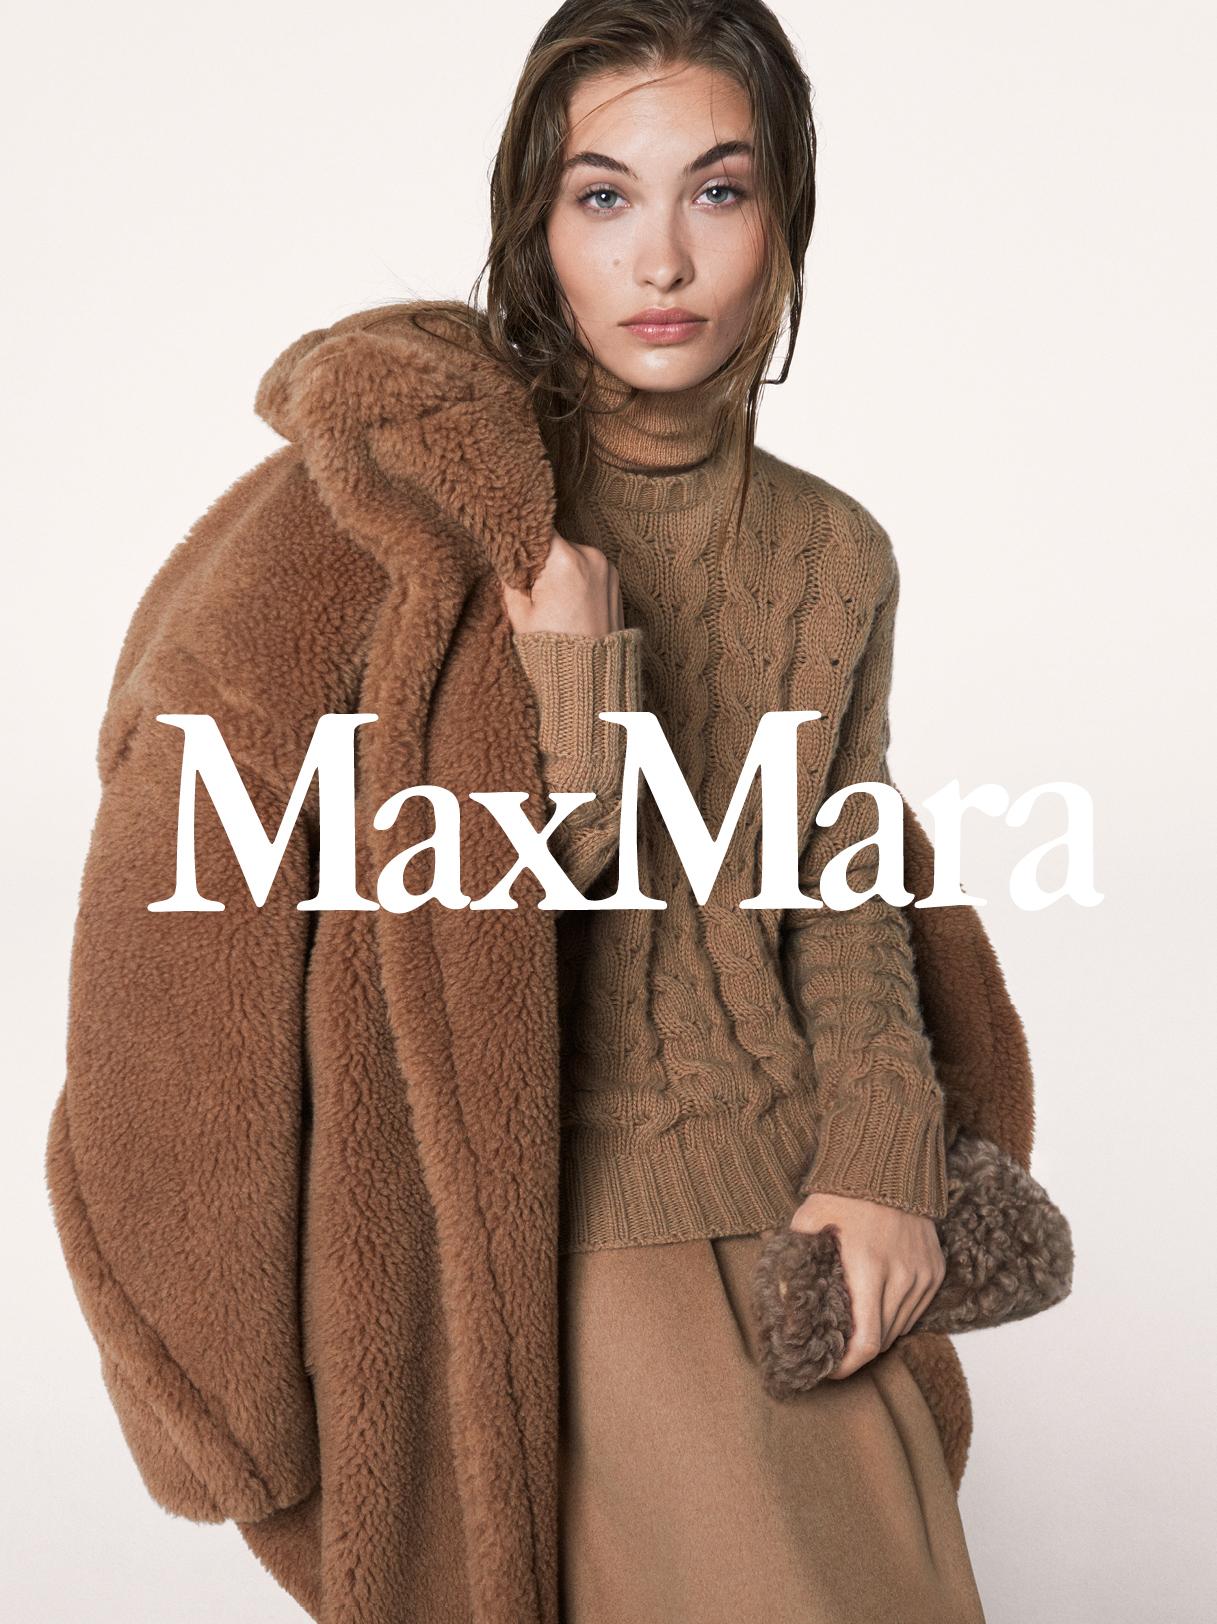 #maxmara #fw17 #stevenmeisel #carineroitfeld #graceelizabeth #fashion #campaign #jimkaemmerling #patmcgrath #guidopalau